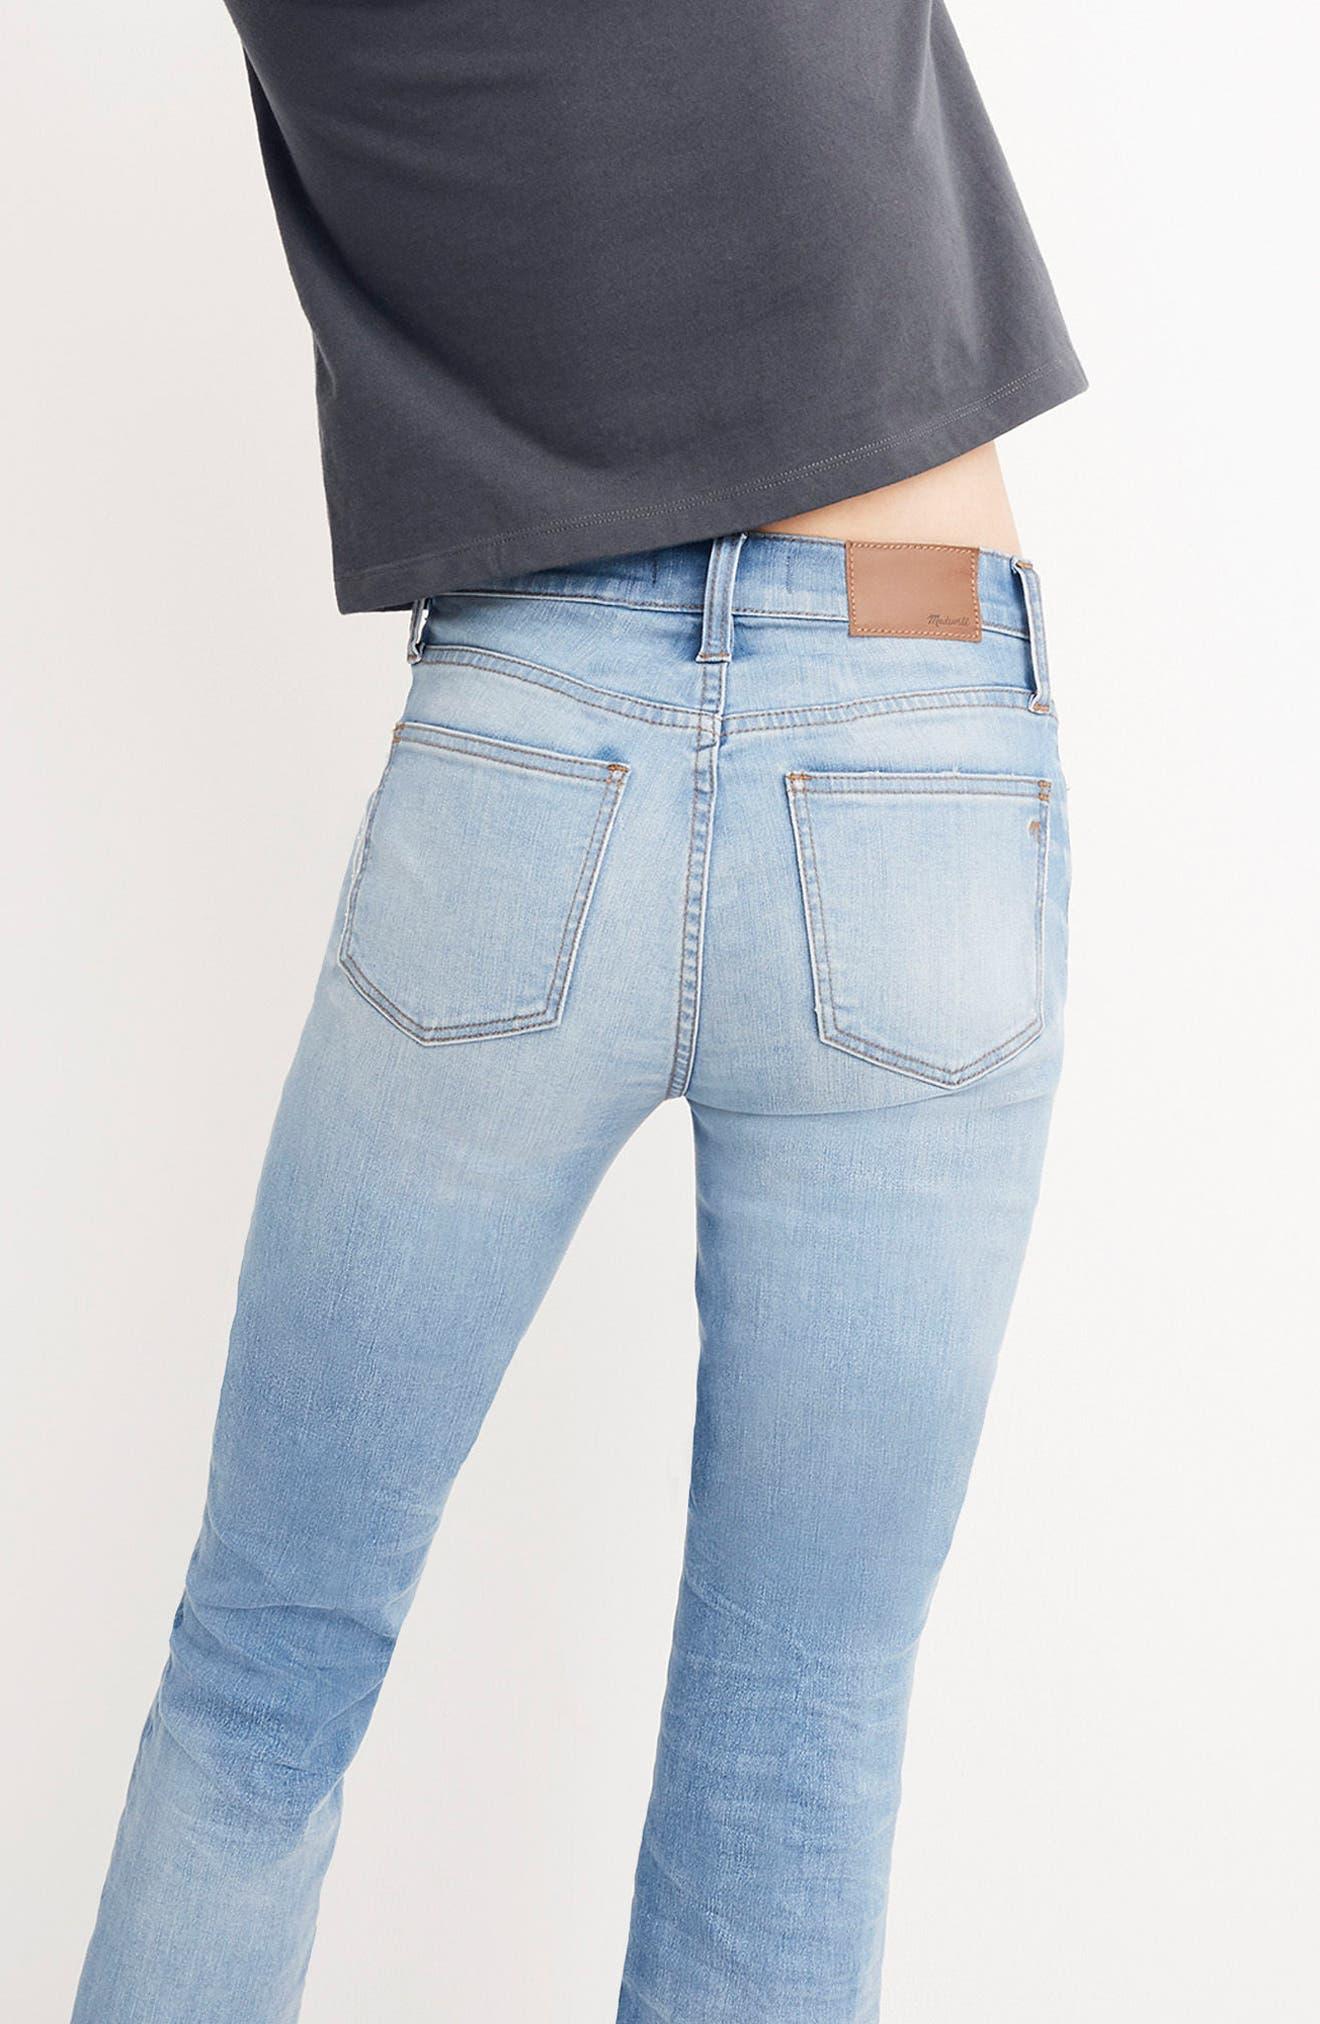 Cali Demi Boot Jeans,                             Alternate thumbnail 6, color,                             400